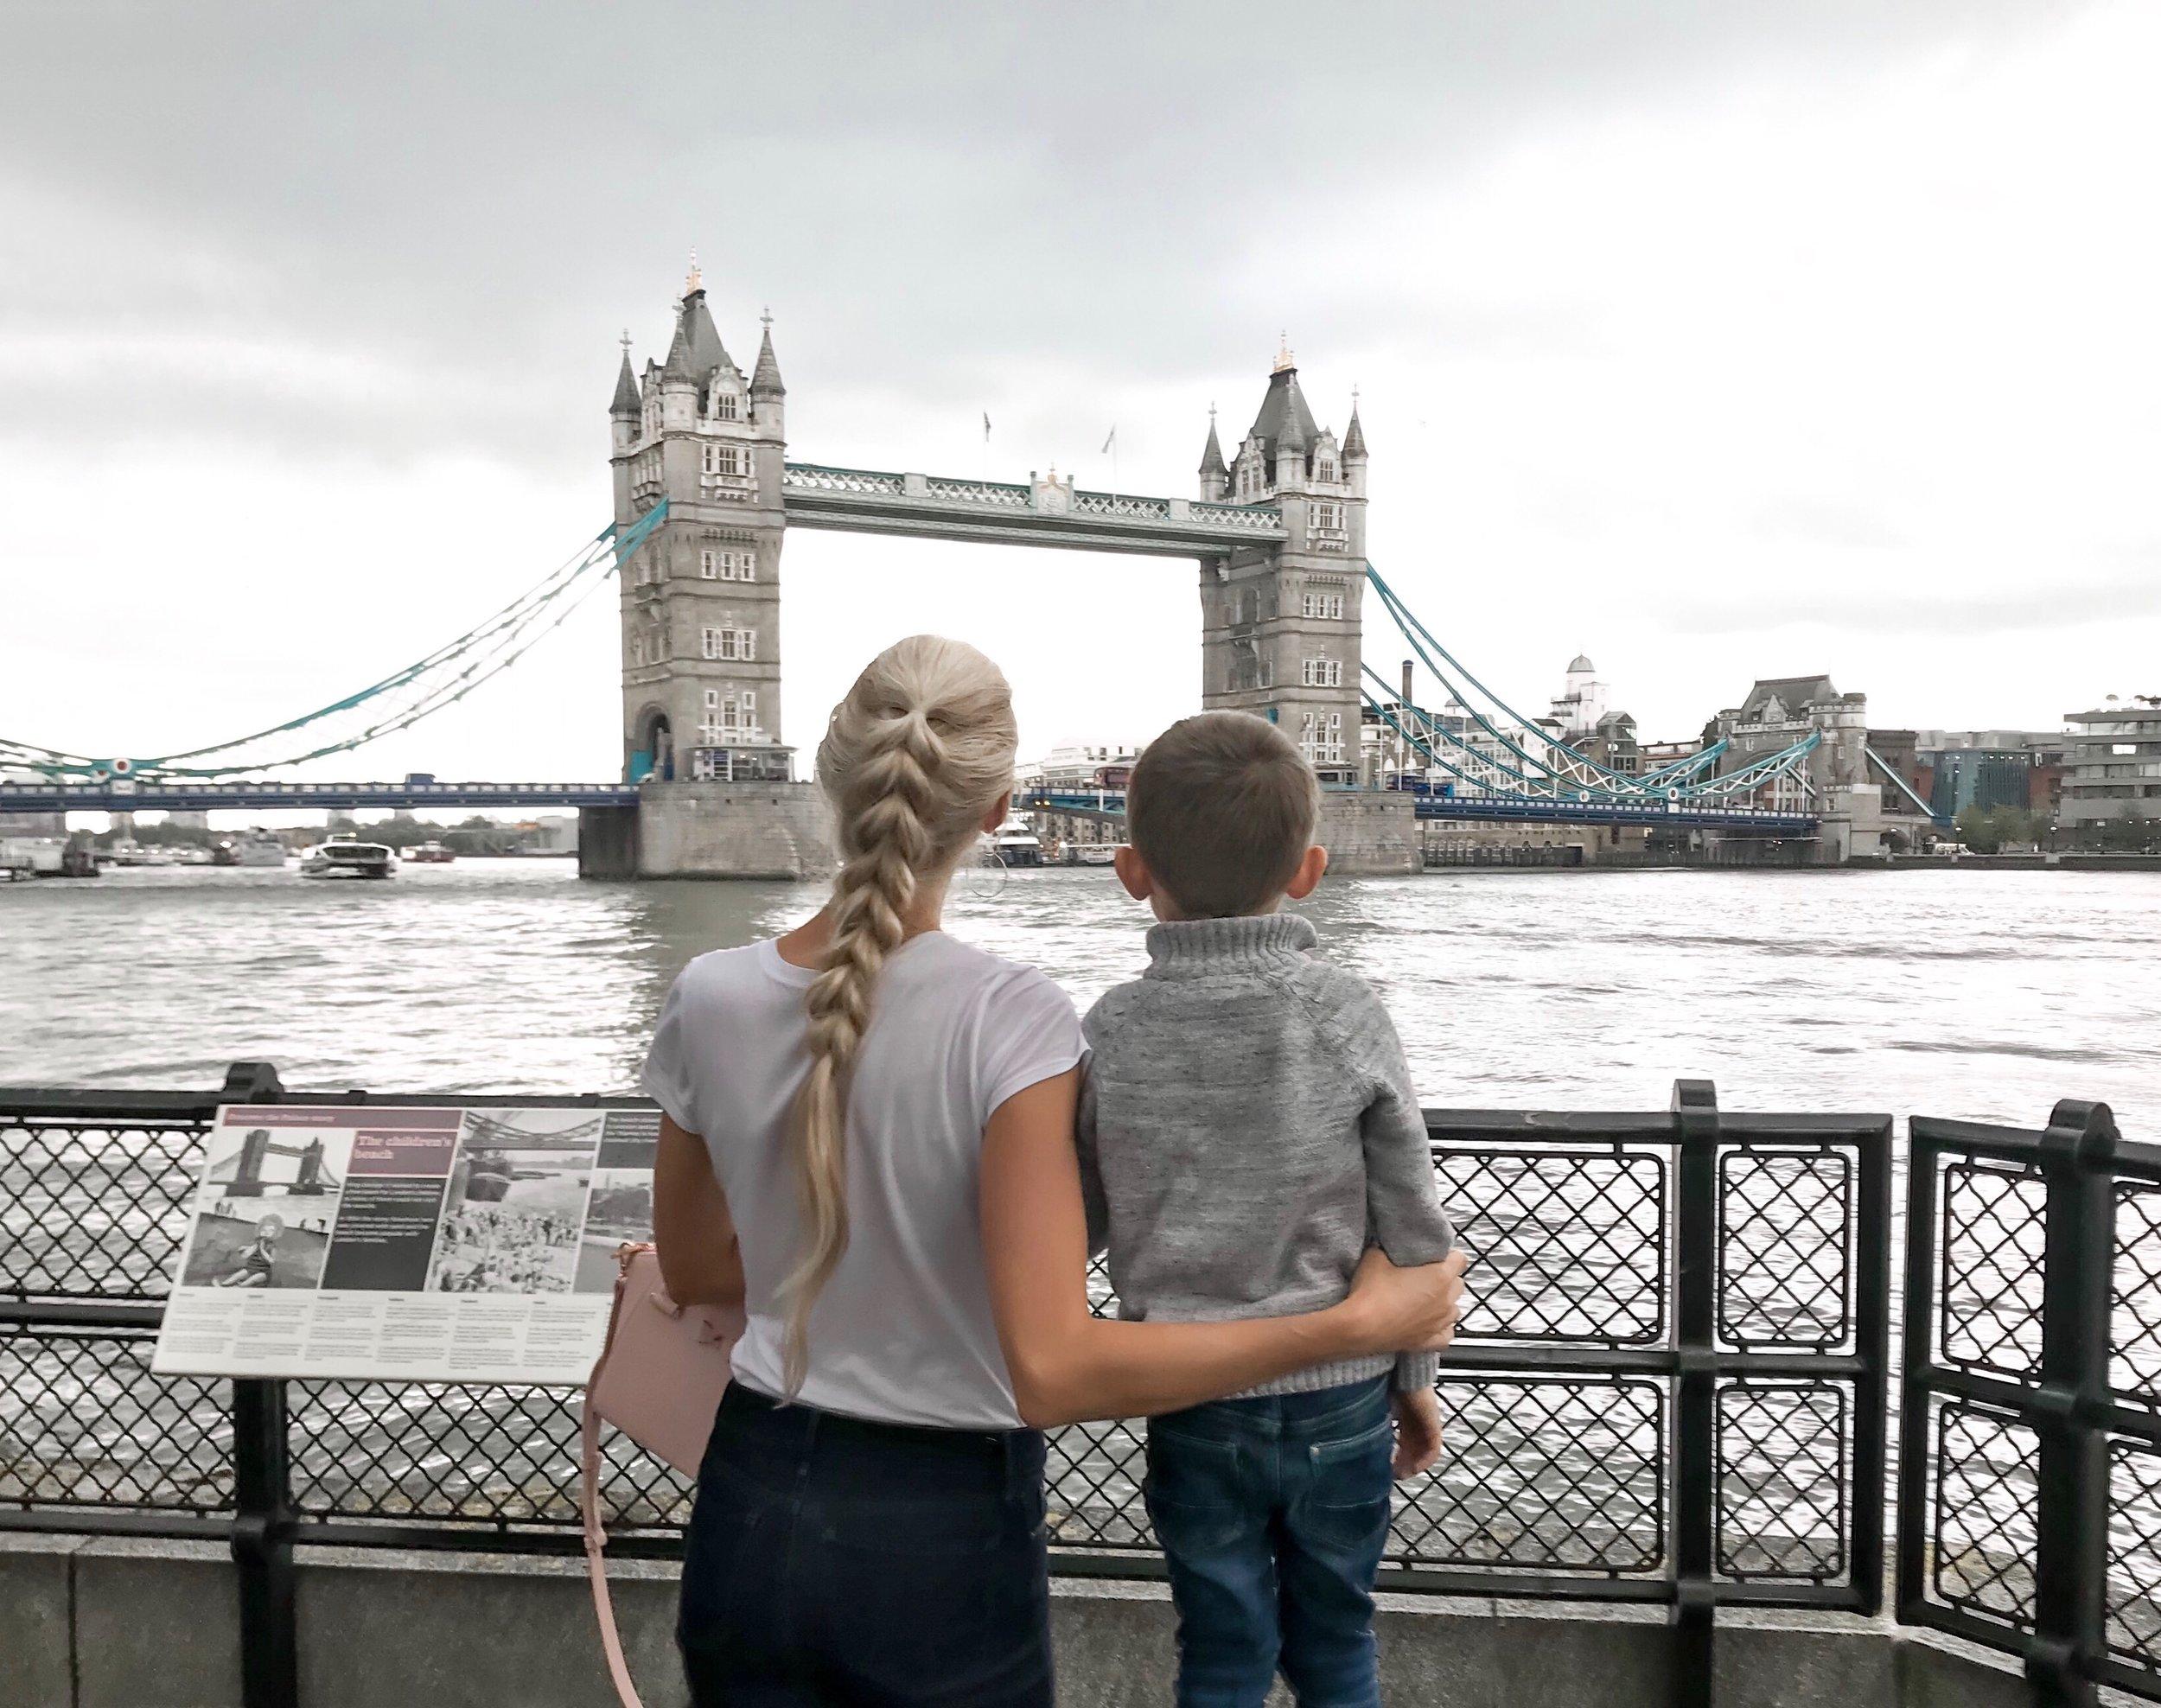 tower-bridge-london-travel-explore-family.jpg